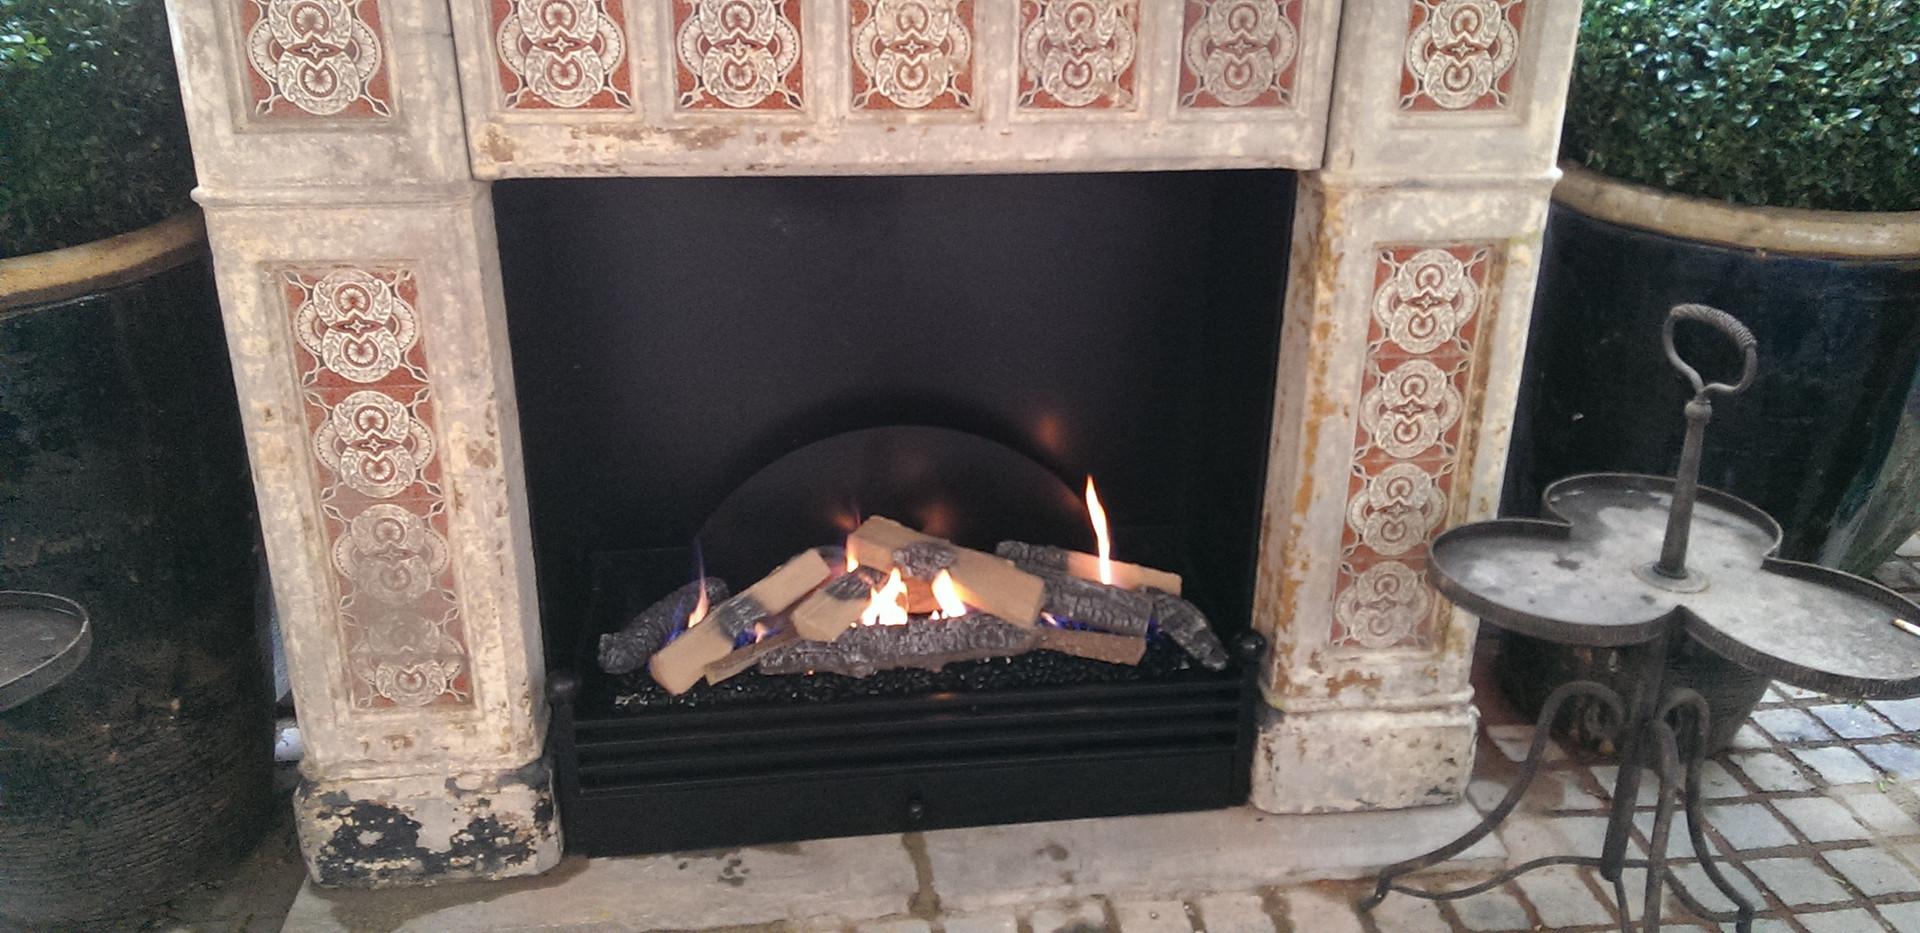 Outdoor fireplace for Cheltenham hotel.